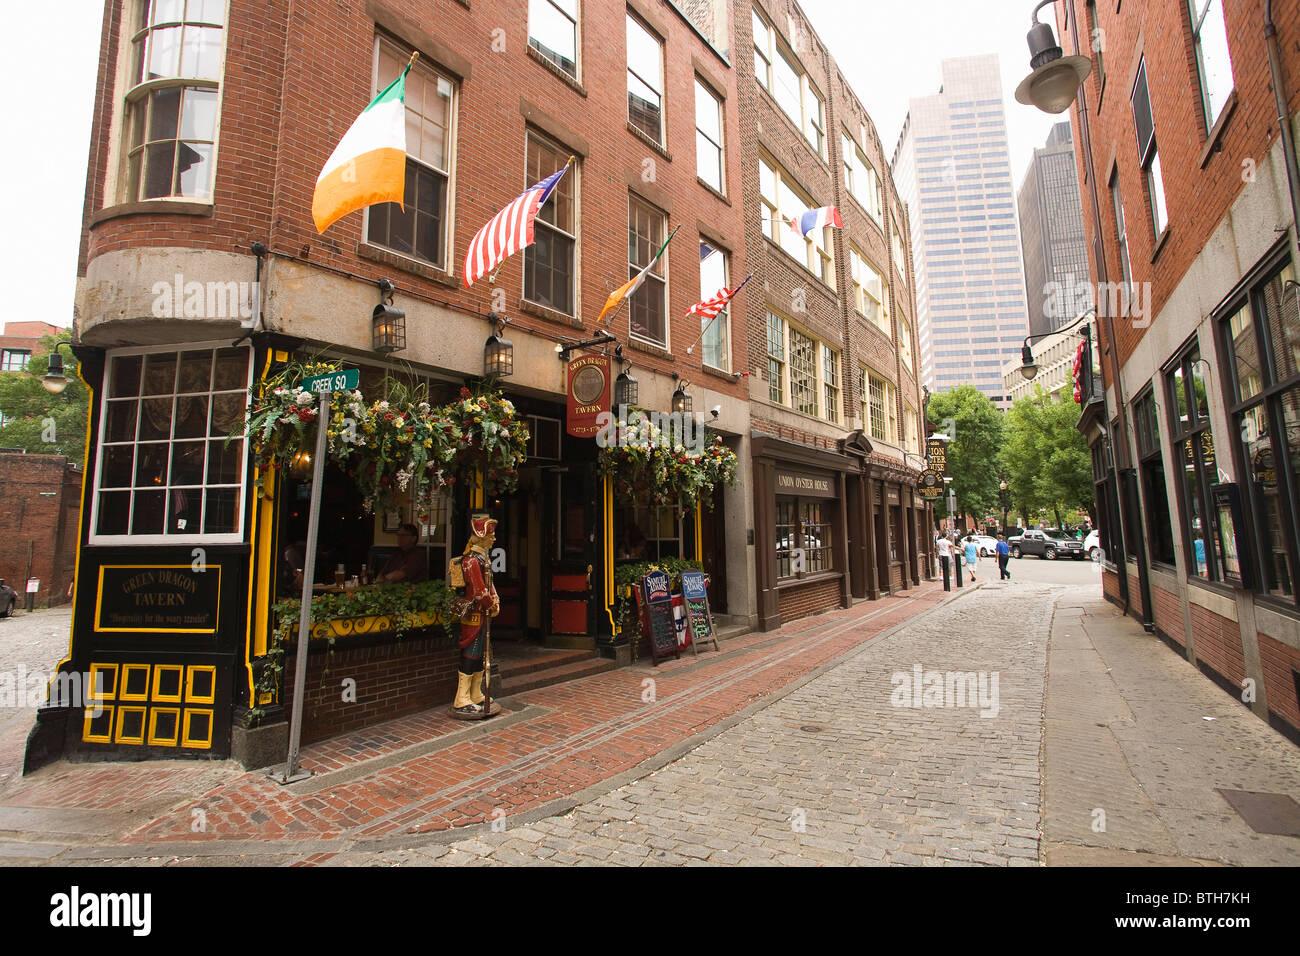 La calle de adoquines en el centro de Boston, Massachusetts Imagen De Stock